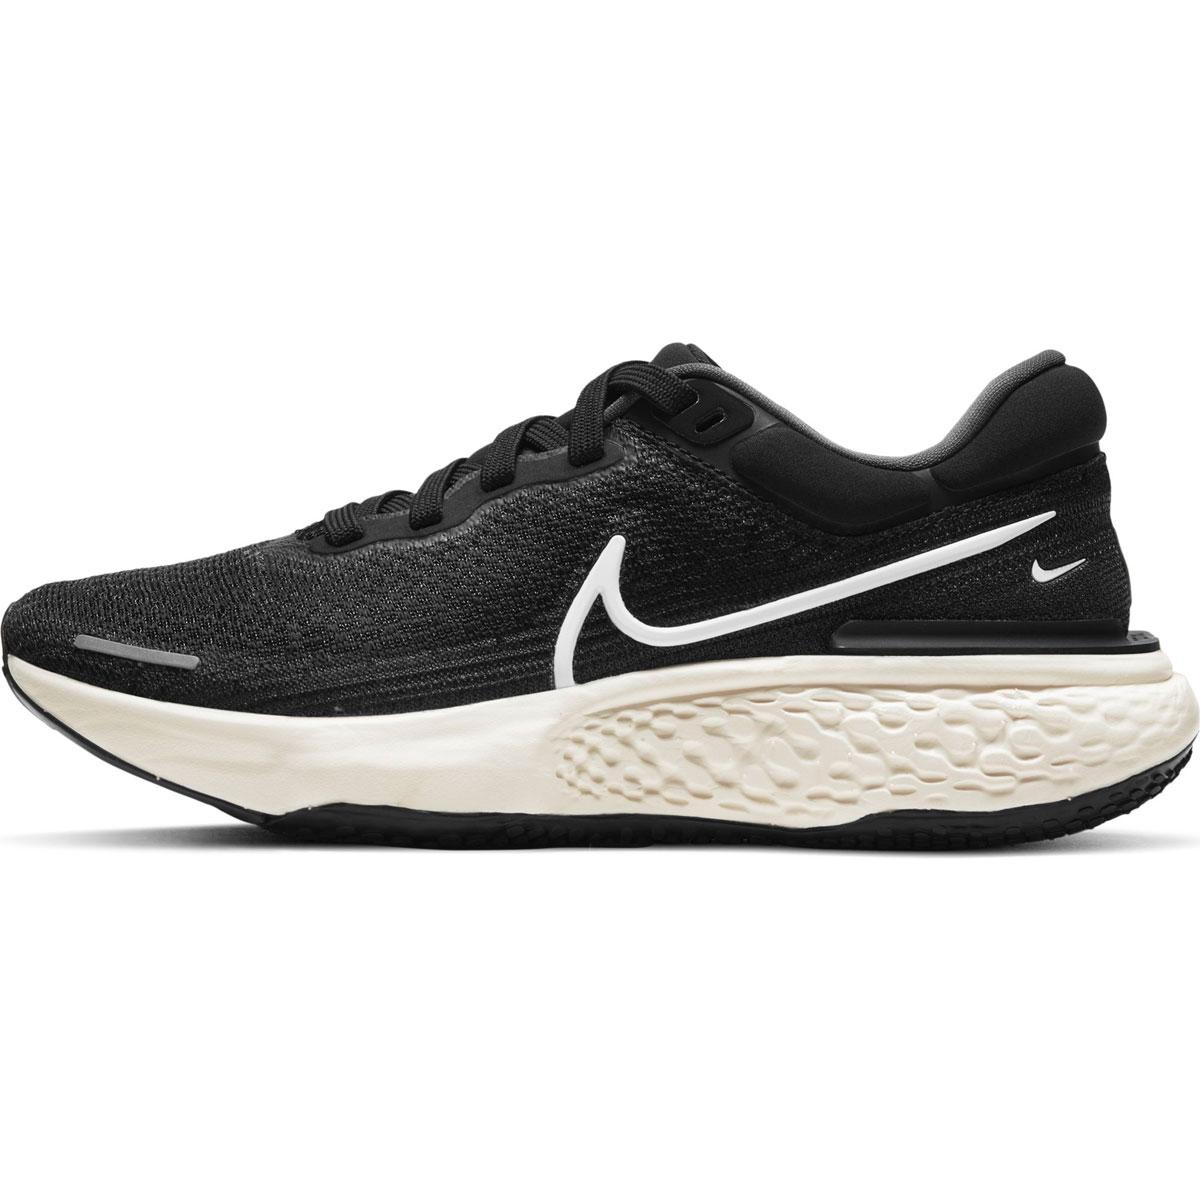 Women's Nike Zoomx Invincible Run FlyKnit Running Shoe - Color: Black/White/Iron Grey - Size: 5 - Width: Regular, Black/White/Iron Grey, large, image 2